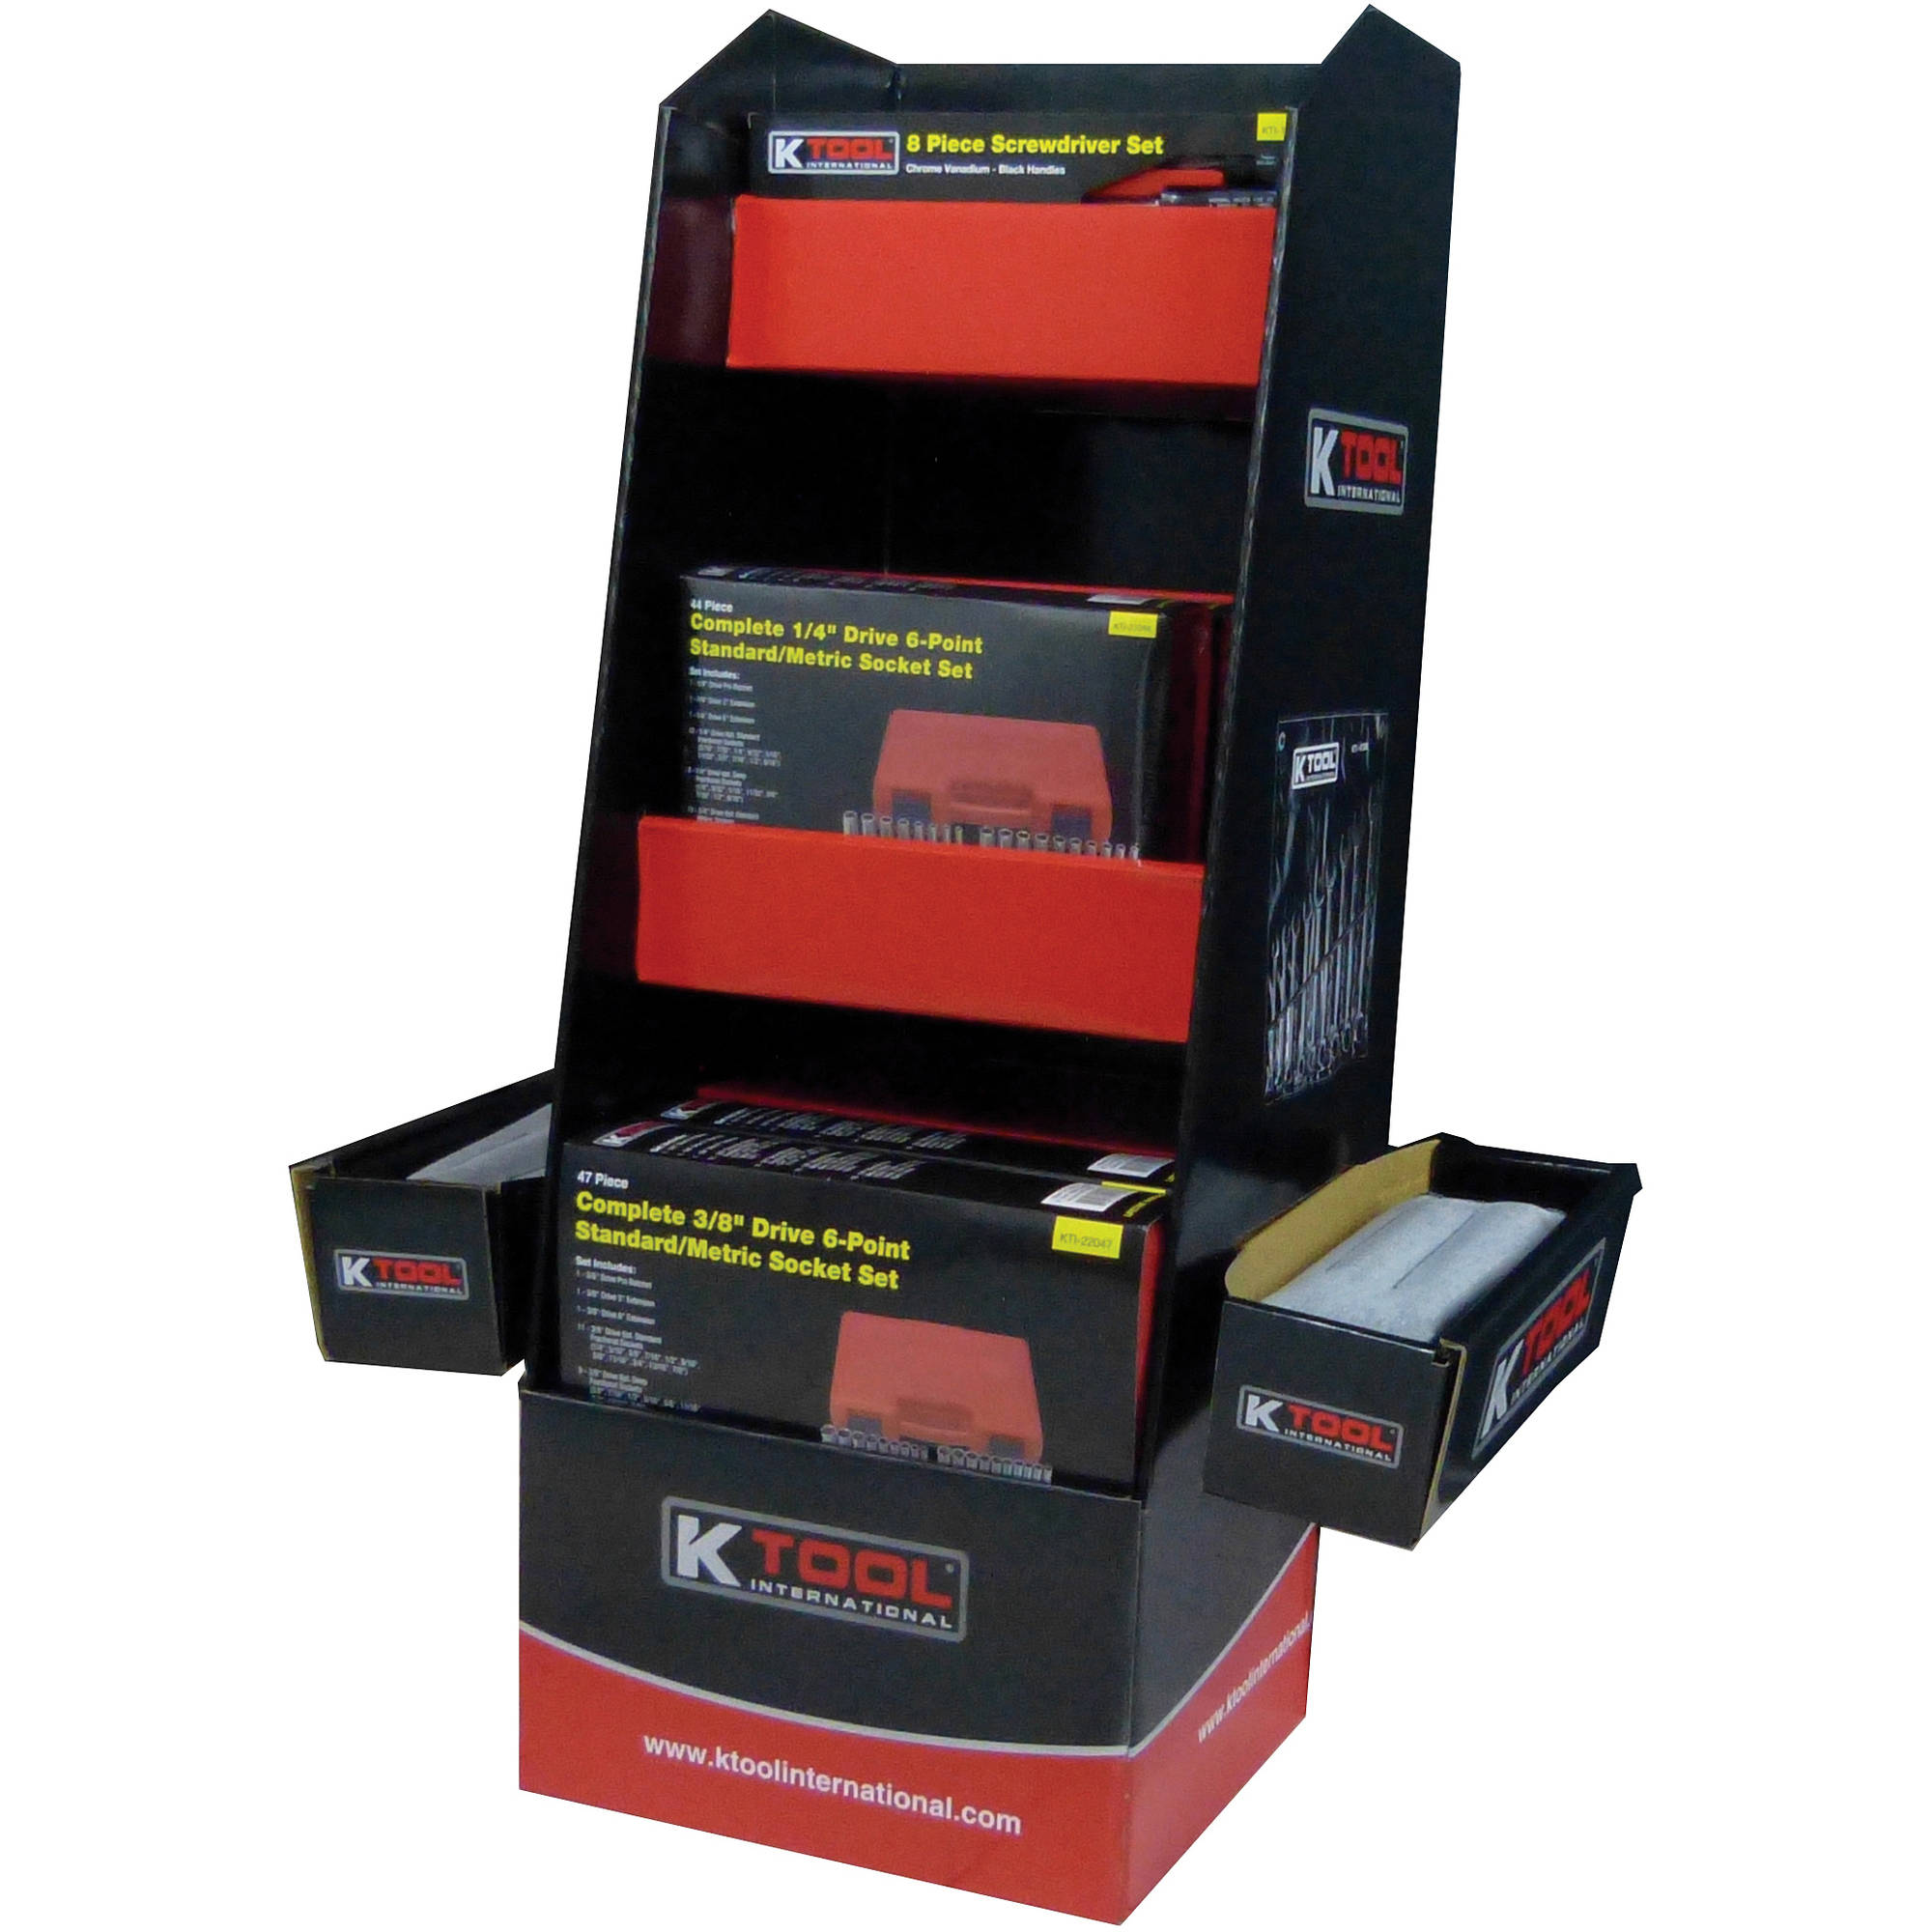 KTI Combination Wrench Set, 12-Piece by K Tool International